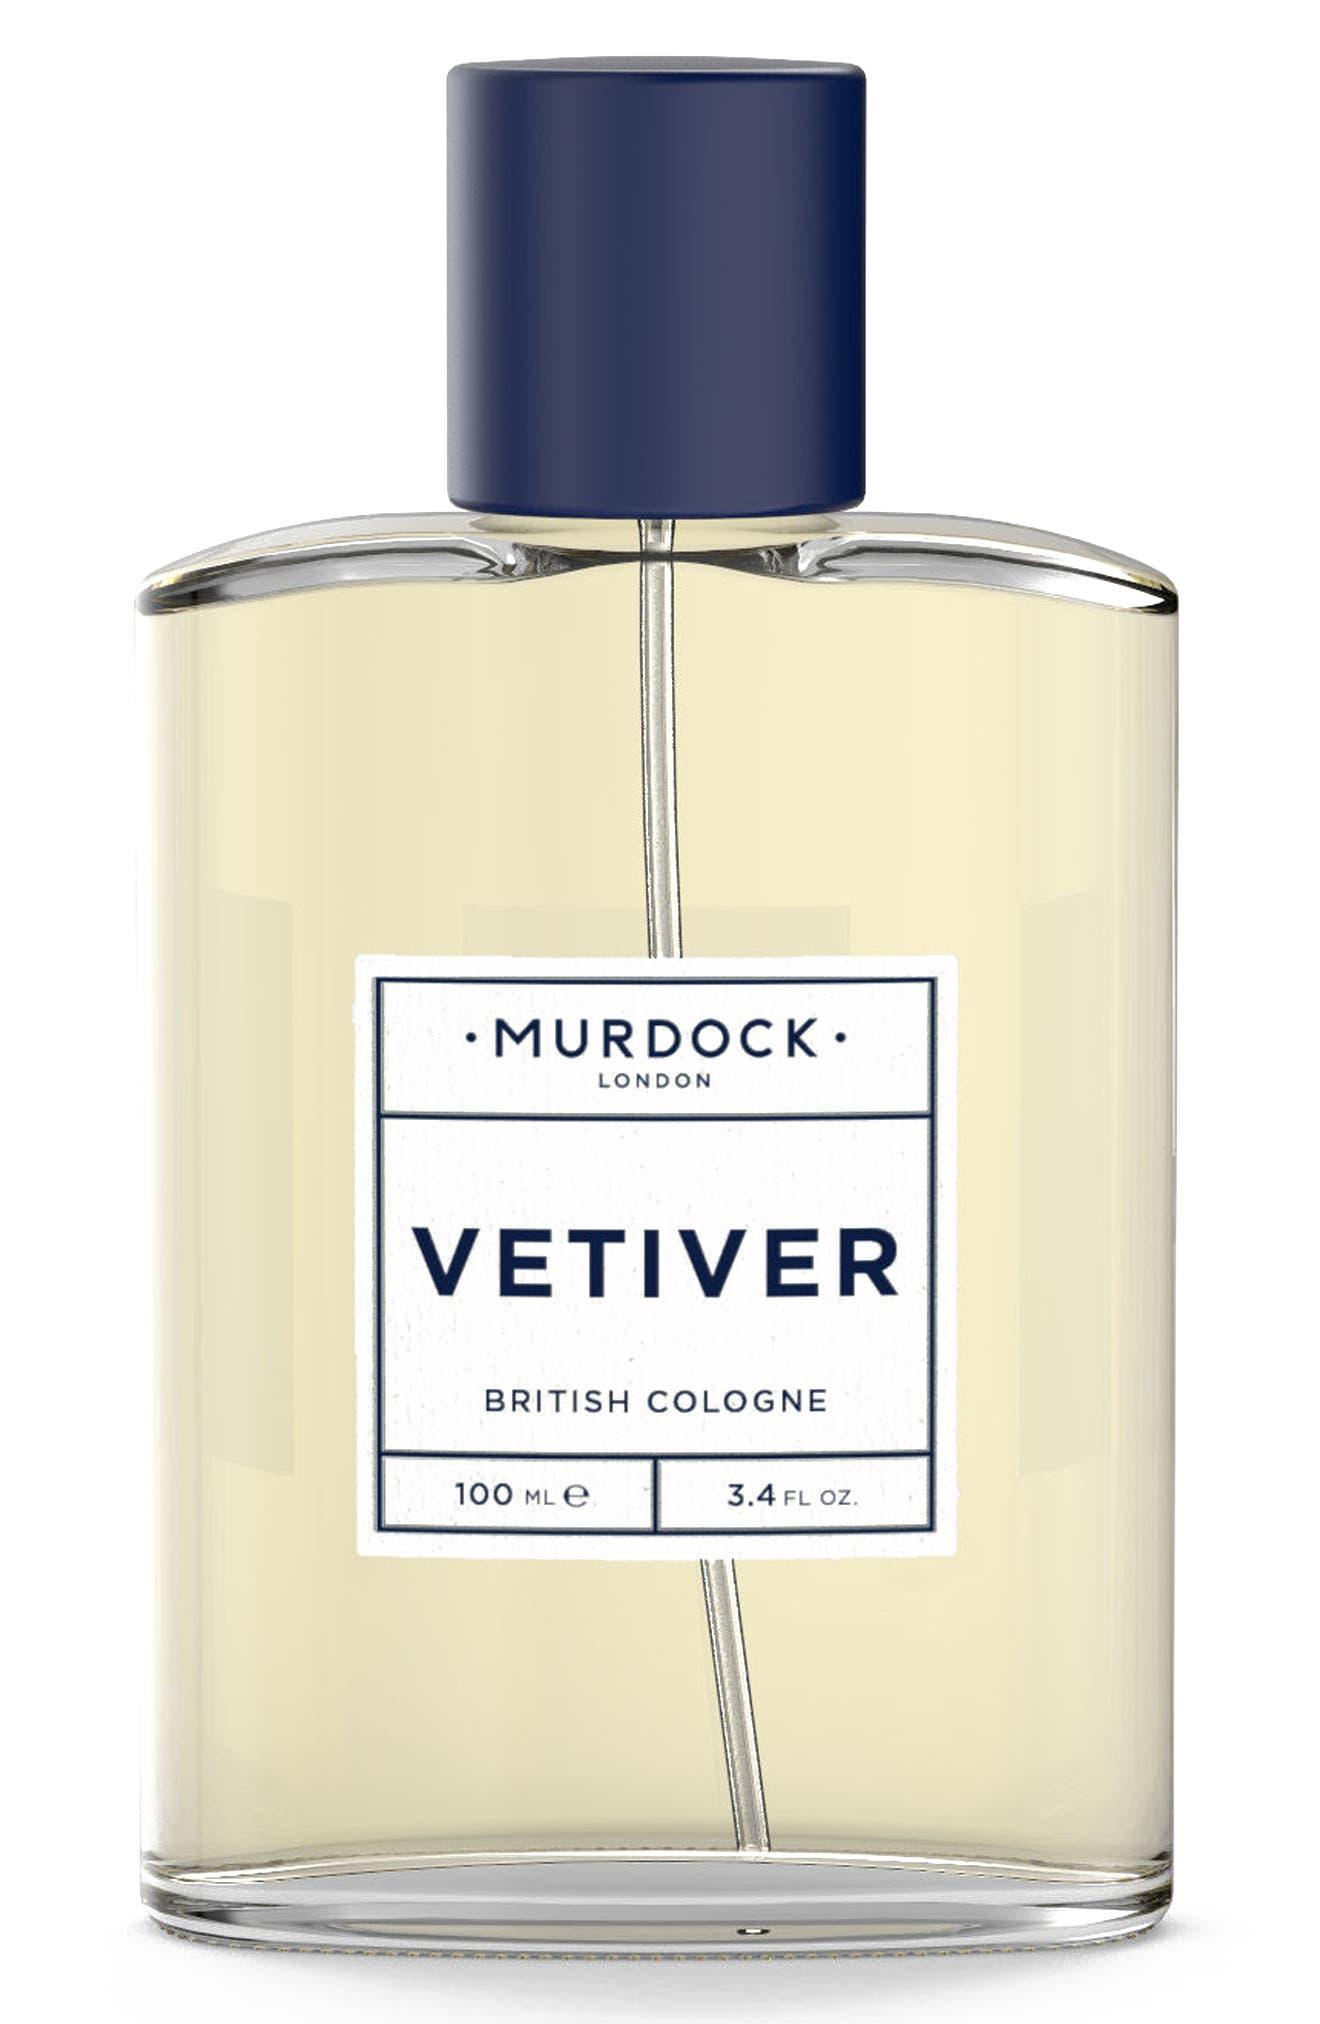 Murdock London Vetiver Cologne (Nordstrom Exclusive)